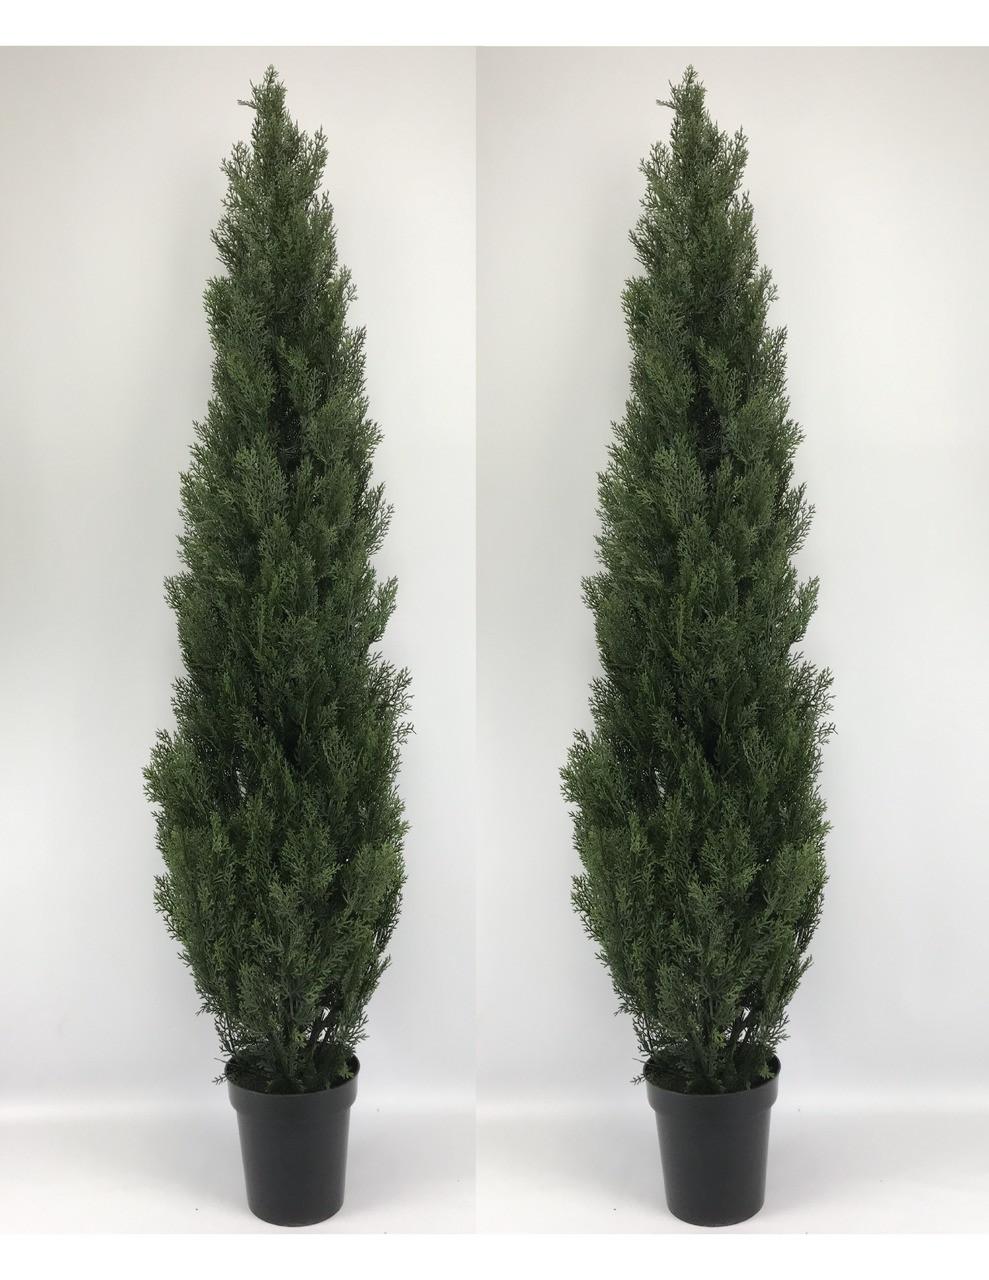 Home Furniture Diy 2 Artificial 20 Cedar Ball Topiary Tree Outdoor Uv Cypress Pine 3 4 5 Evergreen Kisetsu System Co Jp